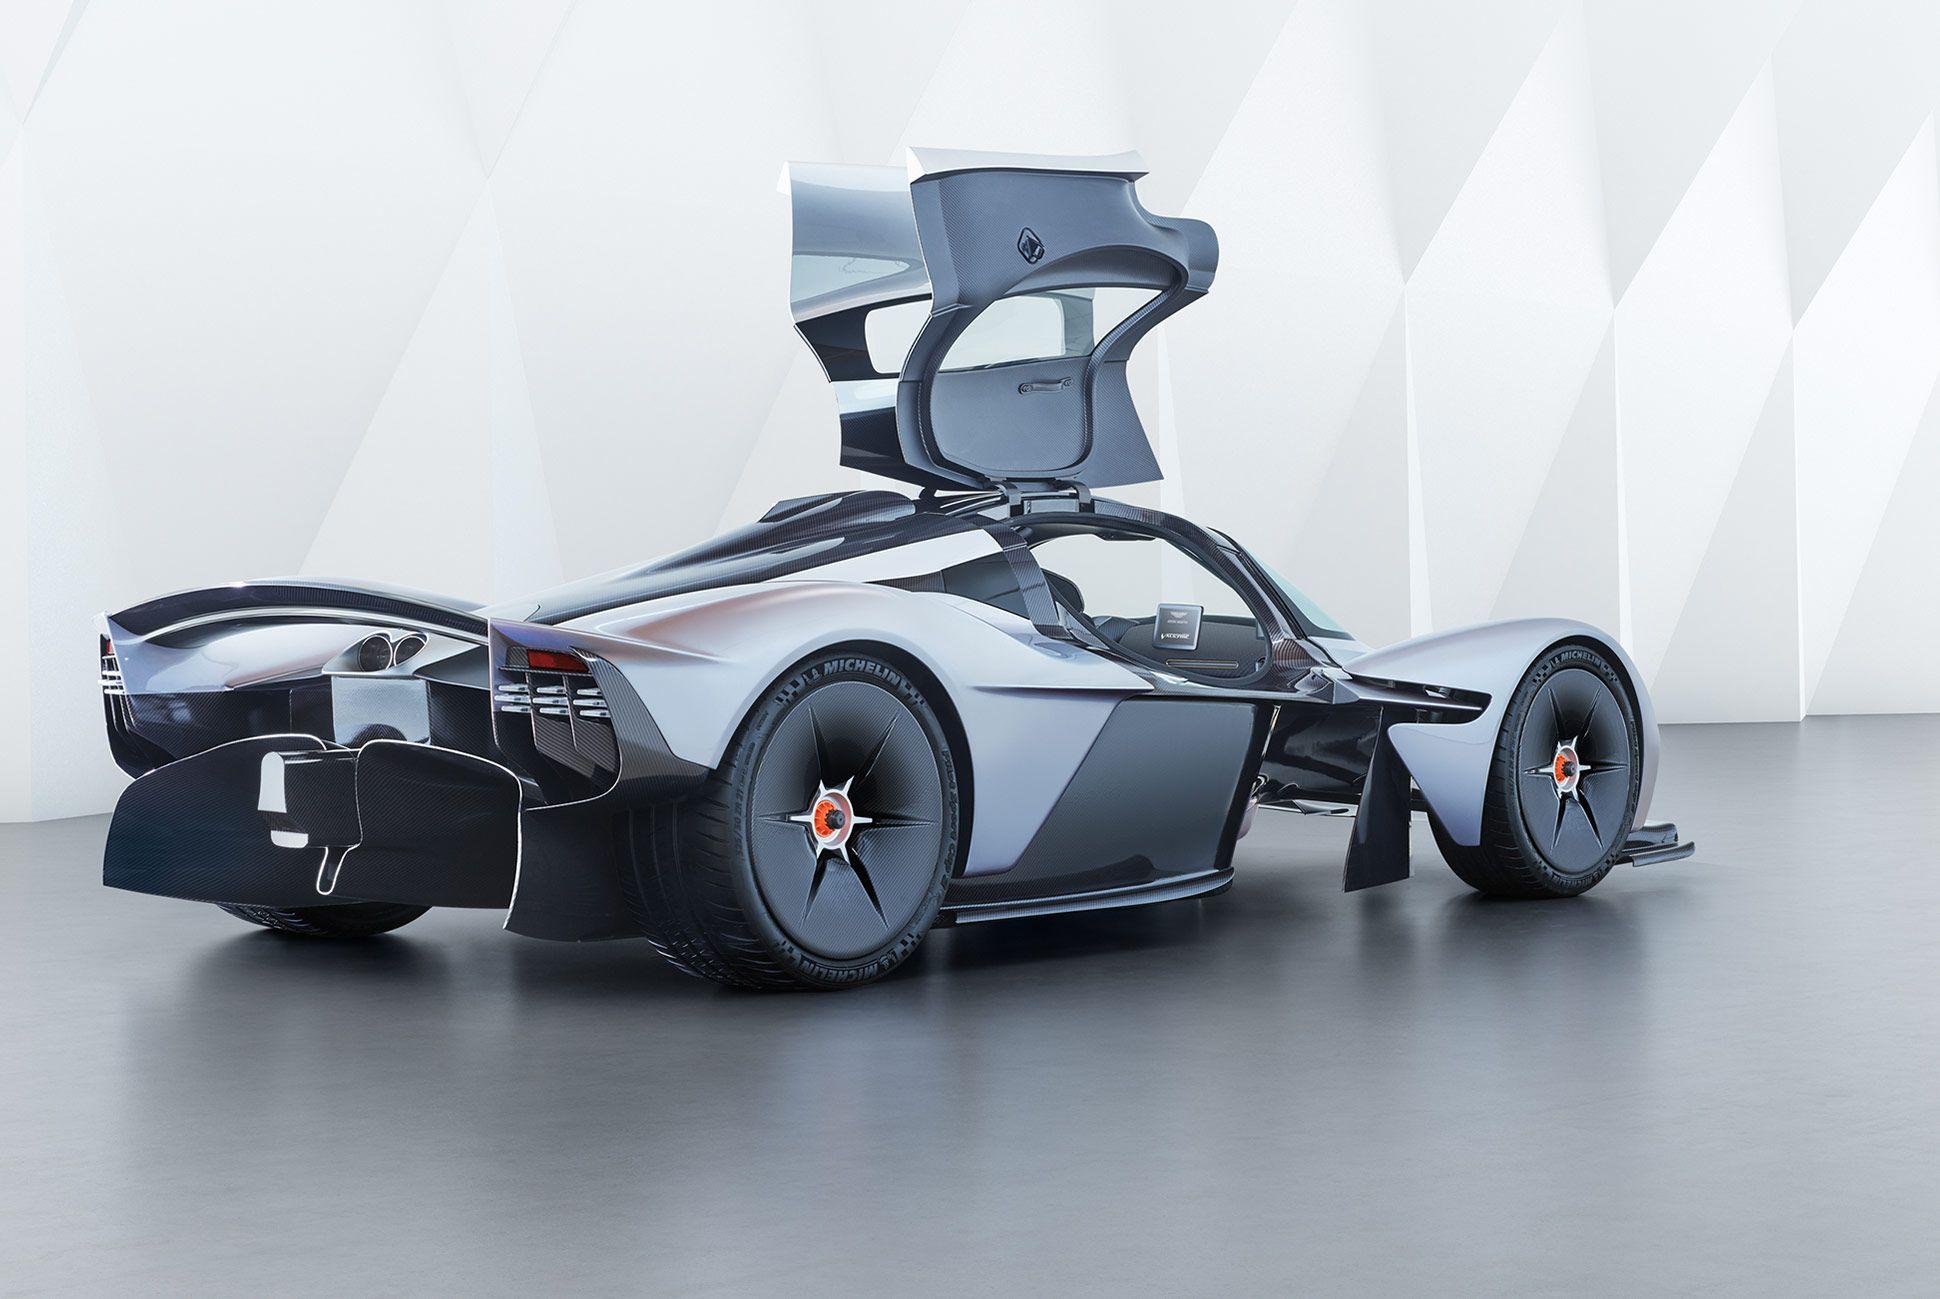 Aston-Martin-Valkyrie-Gear-Patrol-4